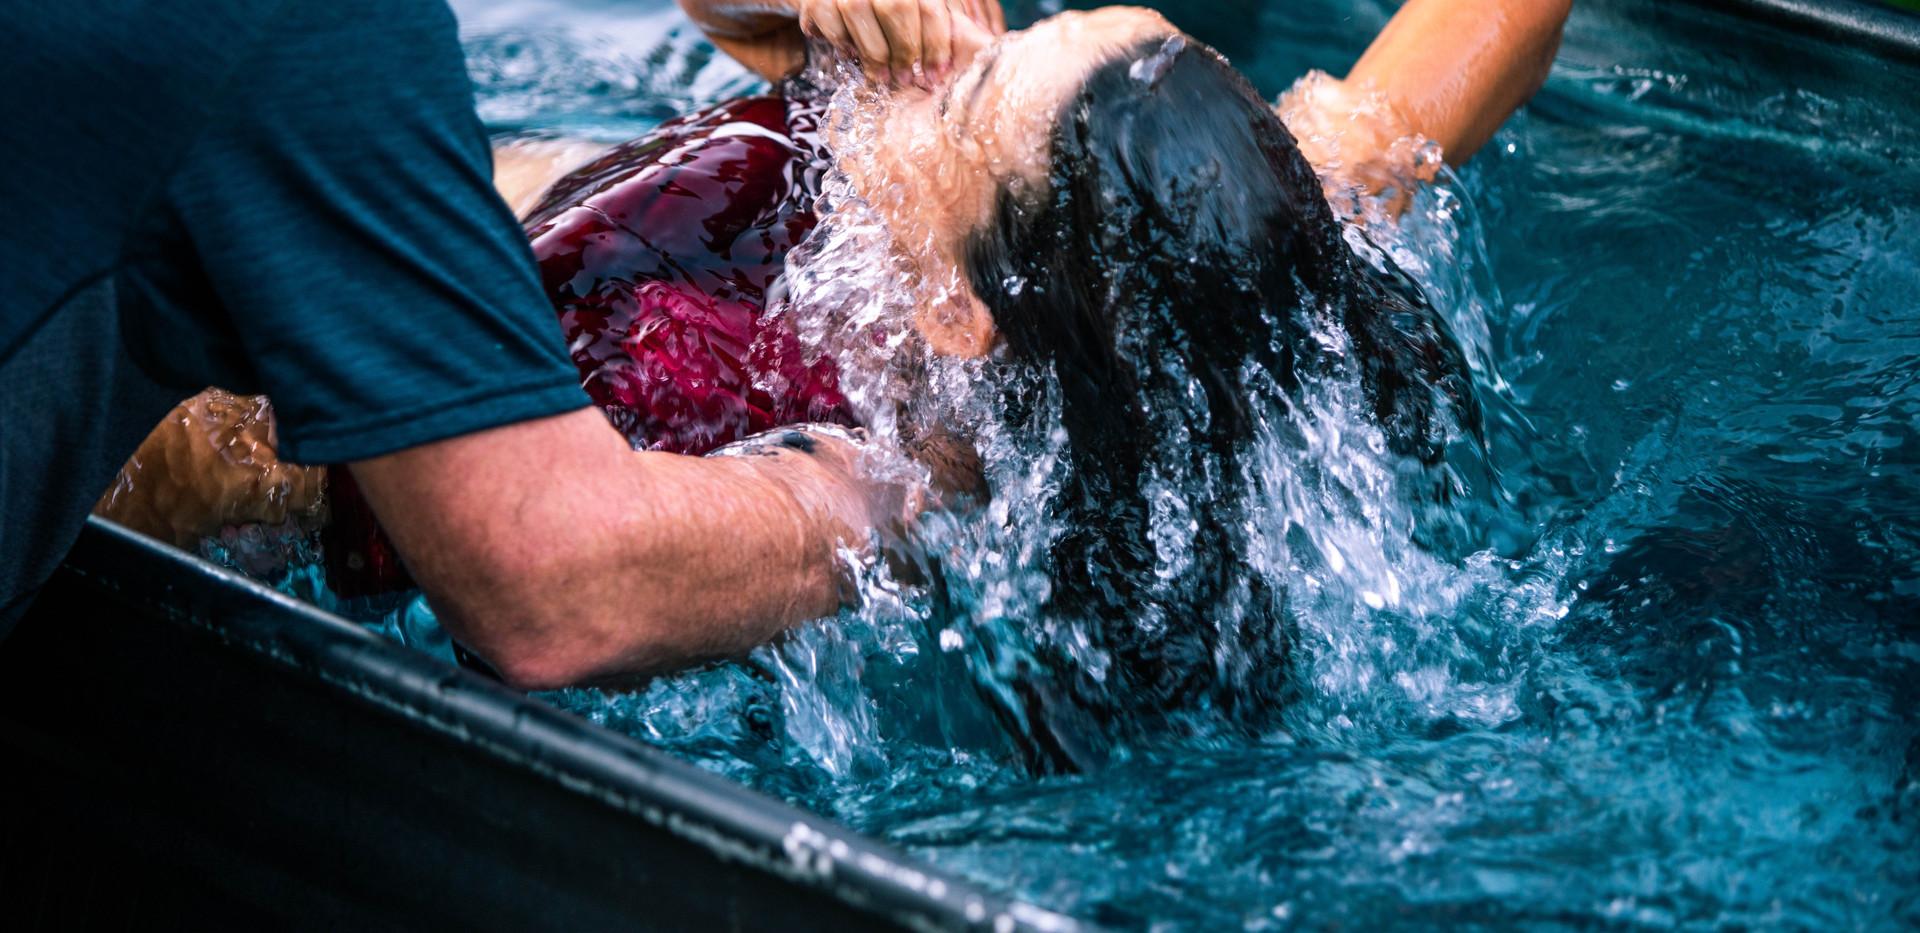 BBQ&Baptism_2019_By-MatDickey-25.jpg